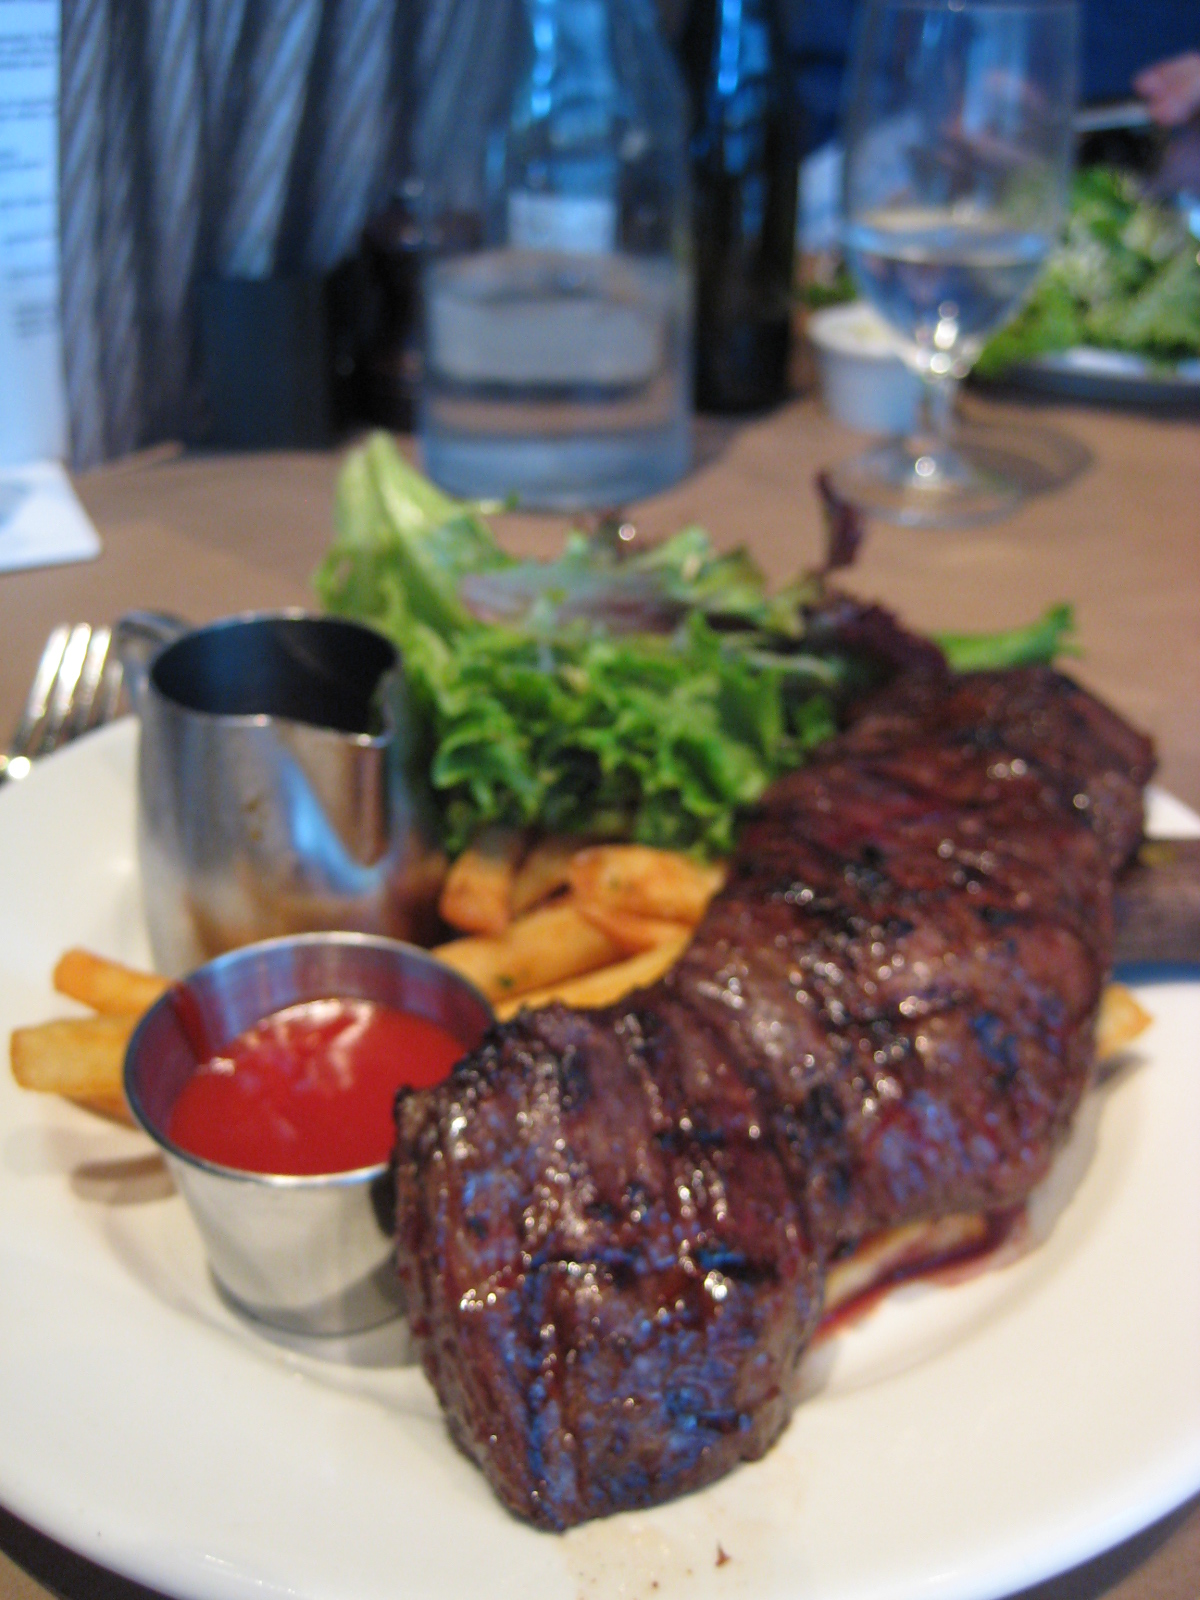 Hangar Steak with Bearnaise Sauce